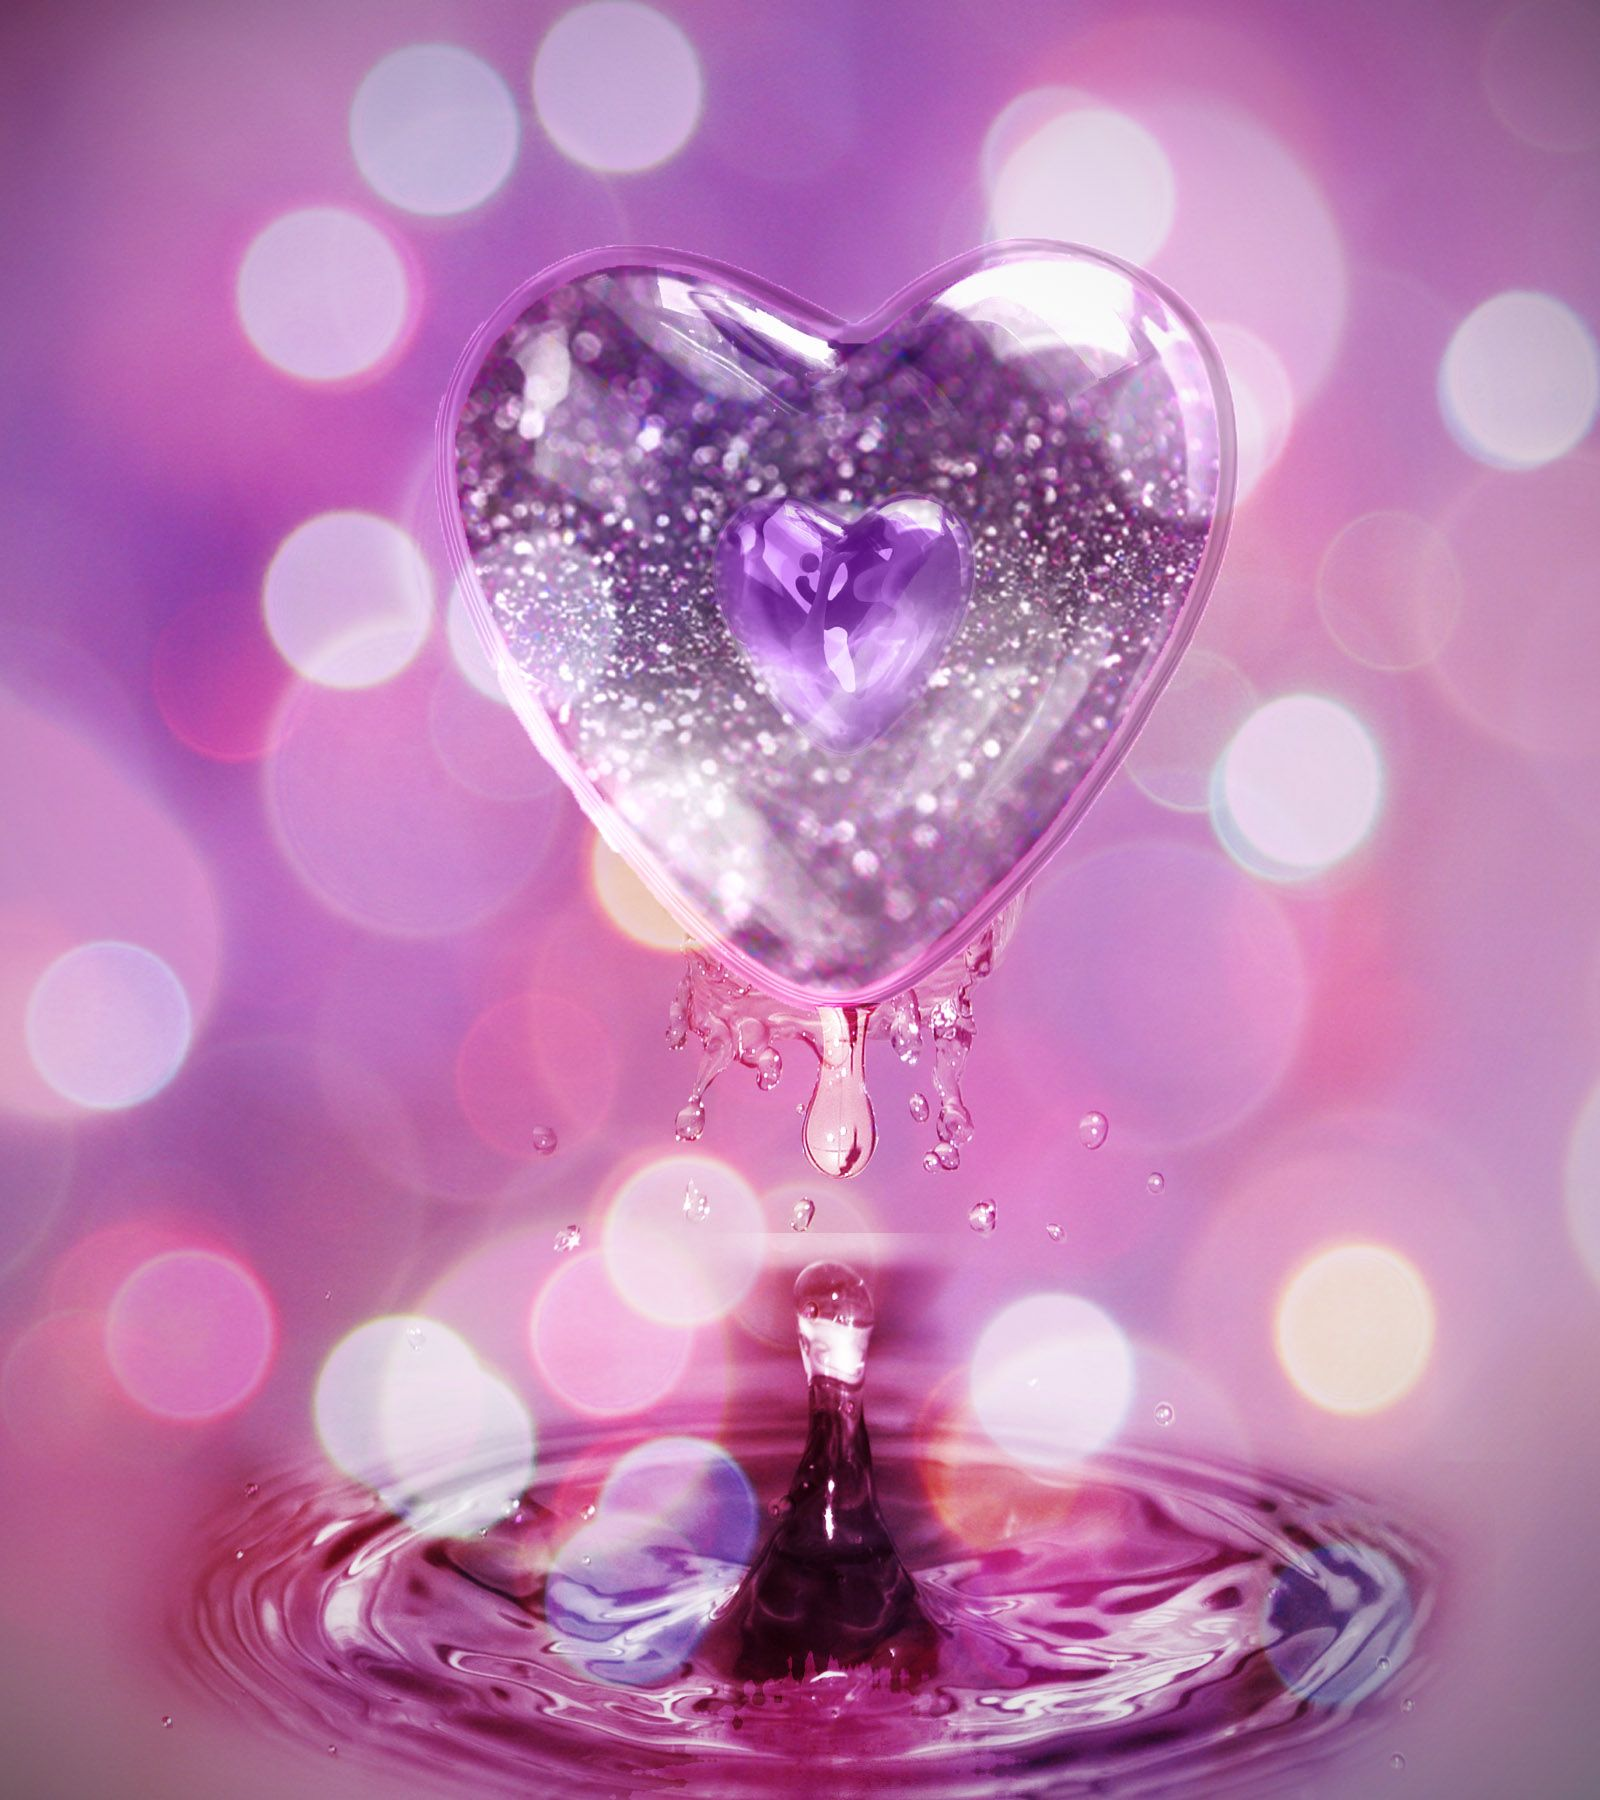 Glitter Hearts Glitter Heart Wallpaper Hd Download